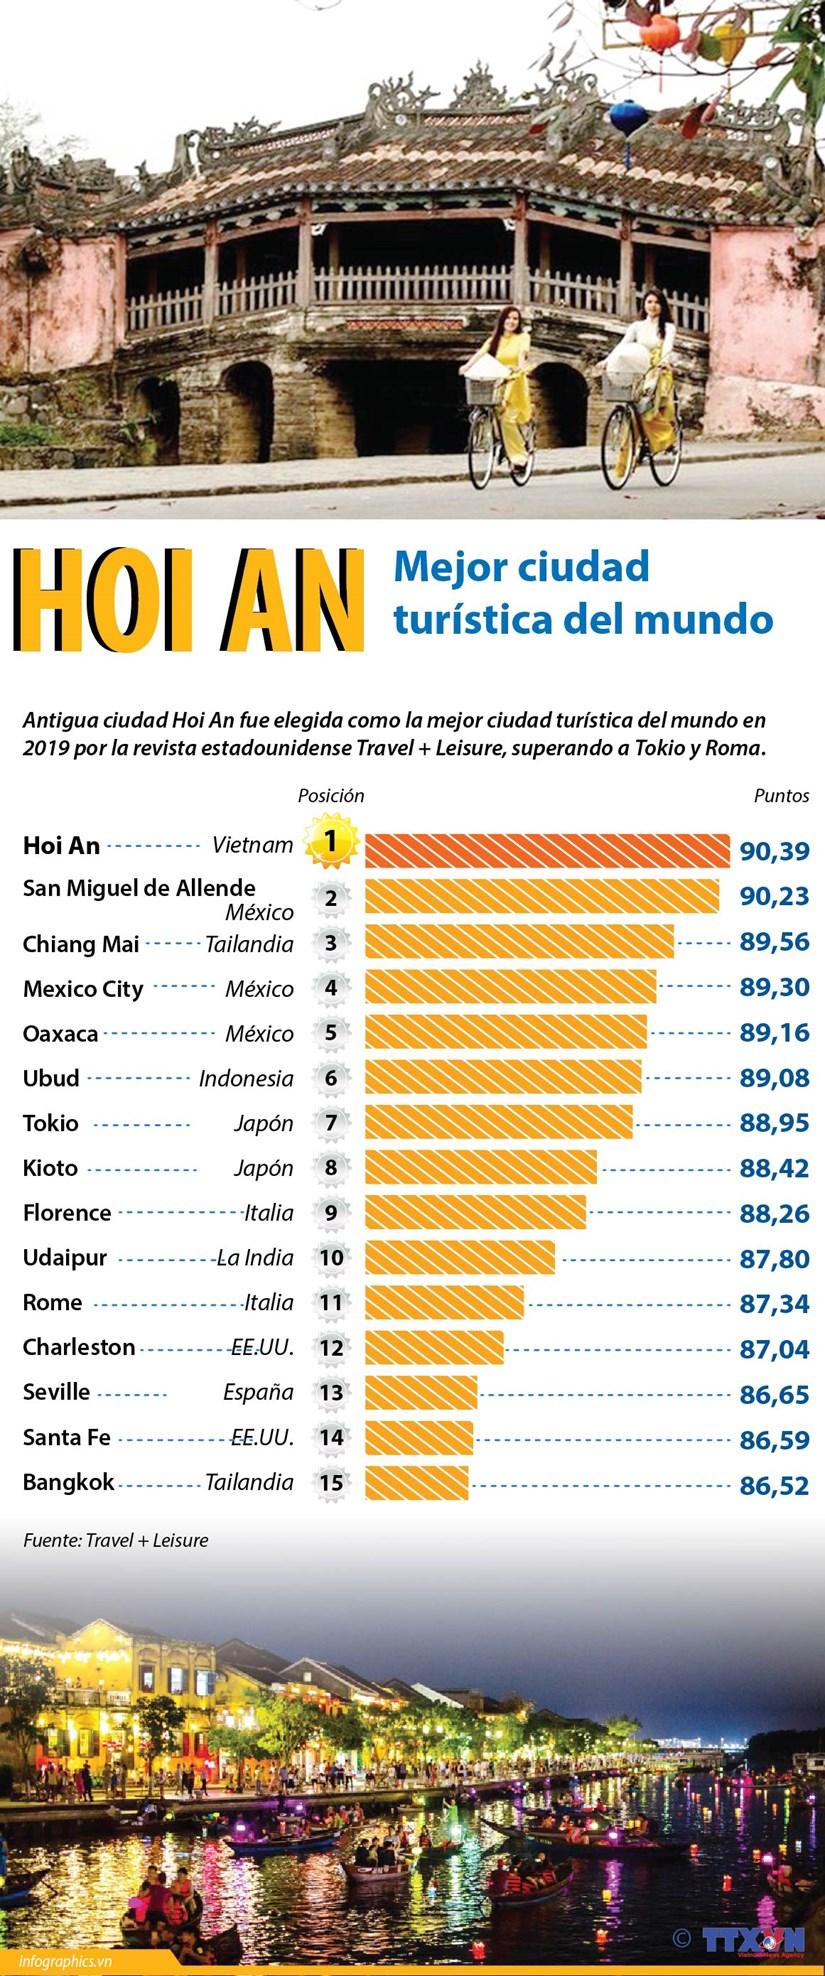 [Info] Hoi An, mejor ciudad turistica del mundo hinh anh 1